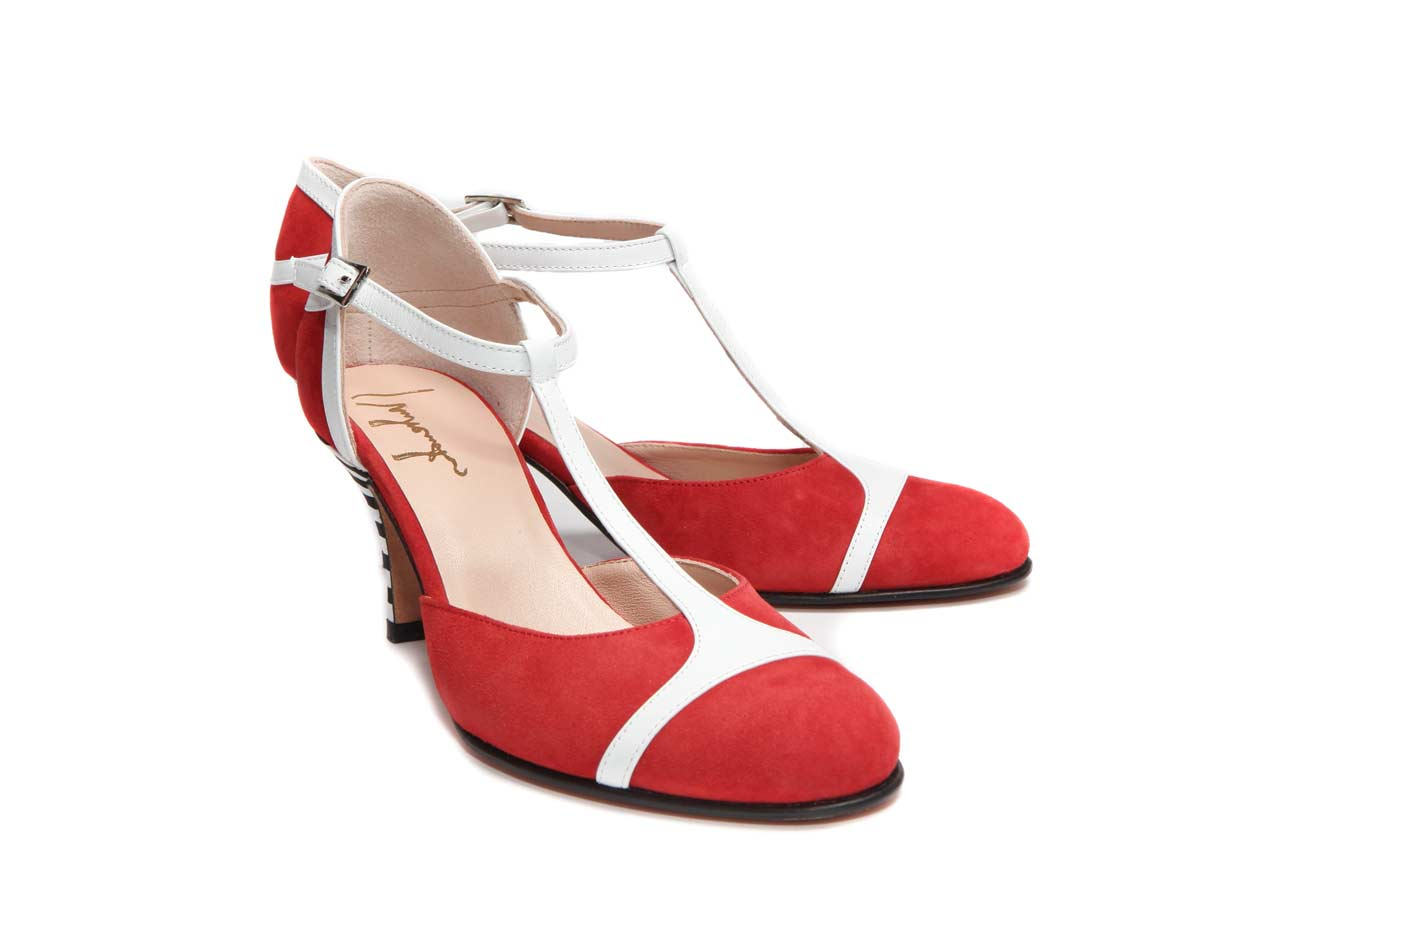 Red kitten heel pumps | Official